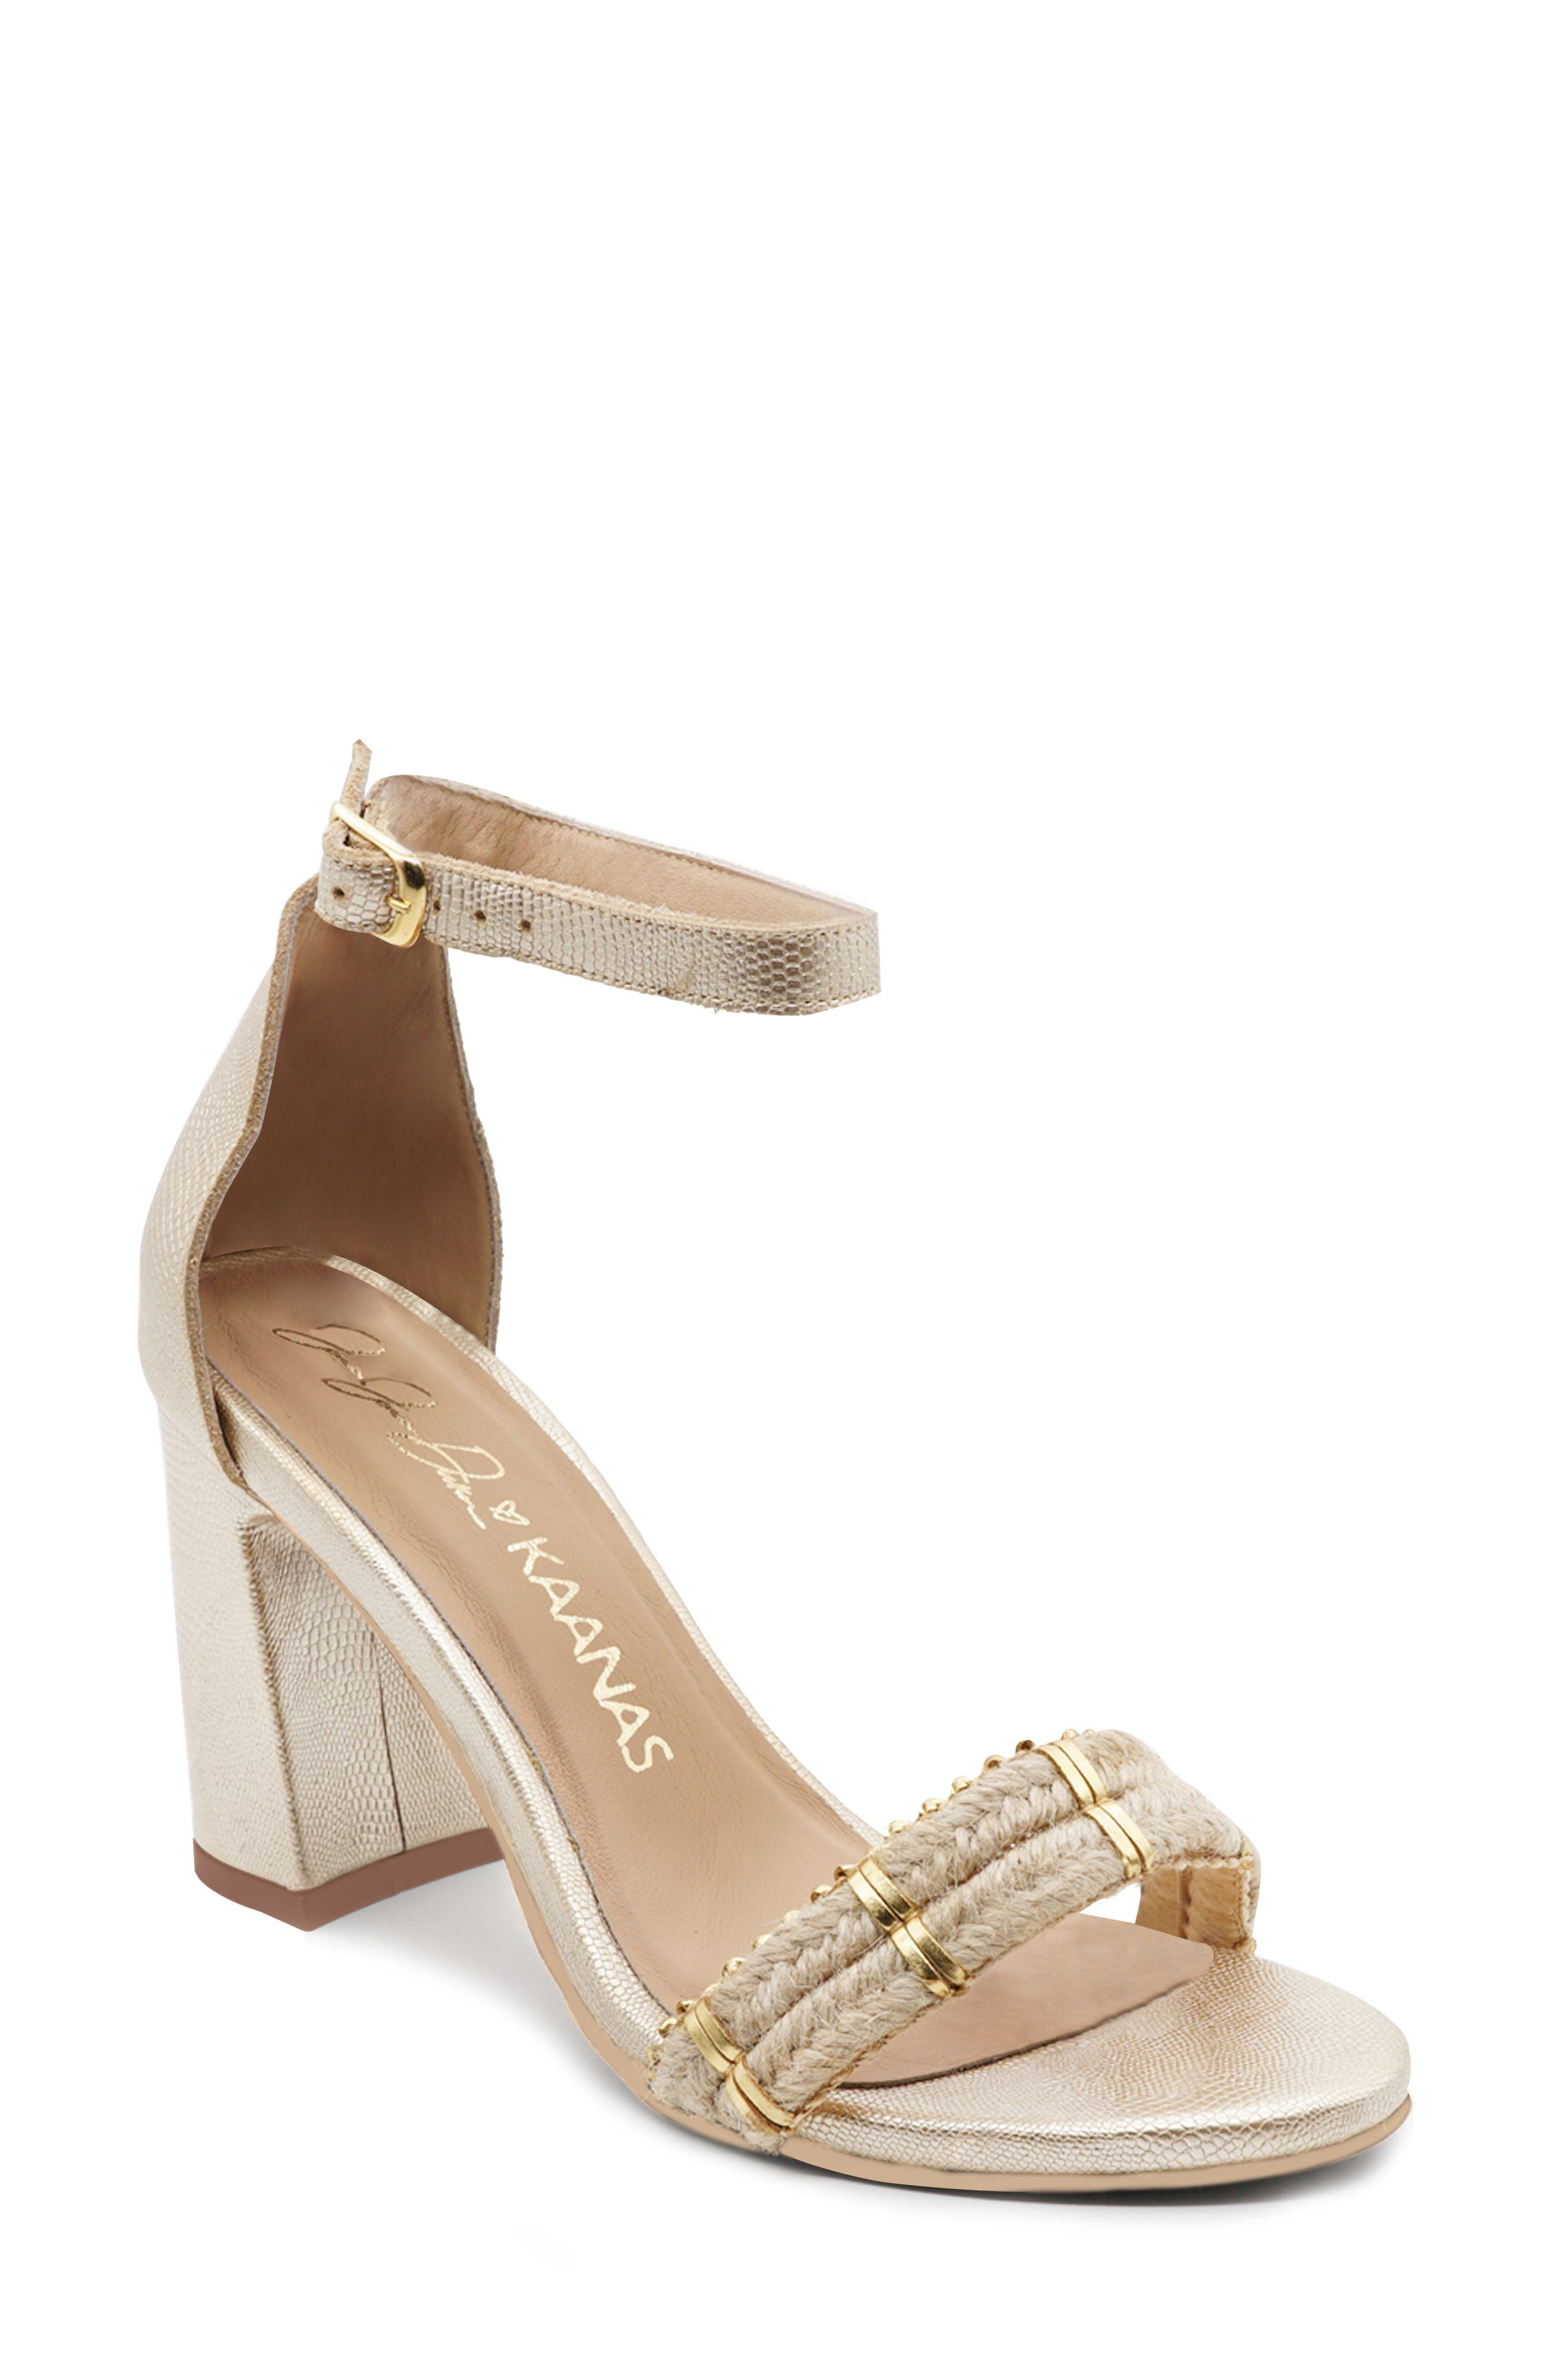 X Jessie James Decker Luzon Ankle Strap Sandal